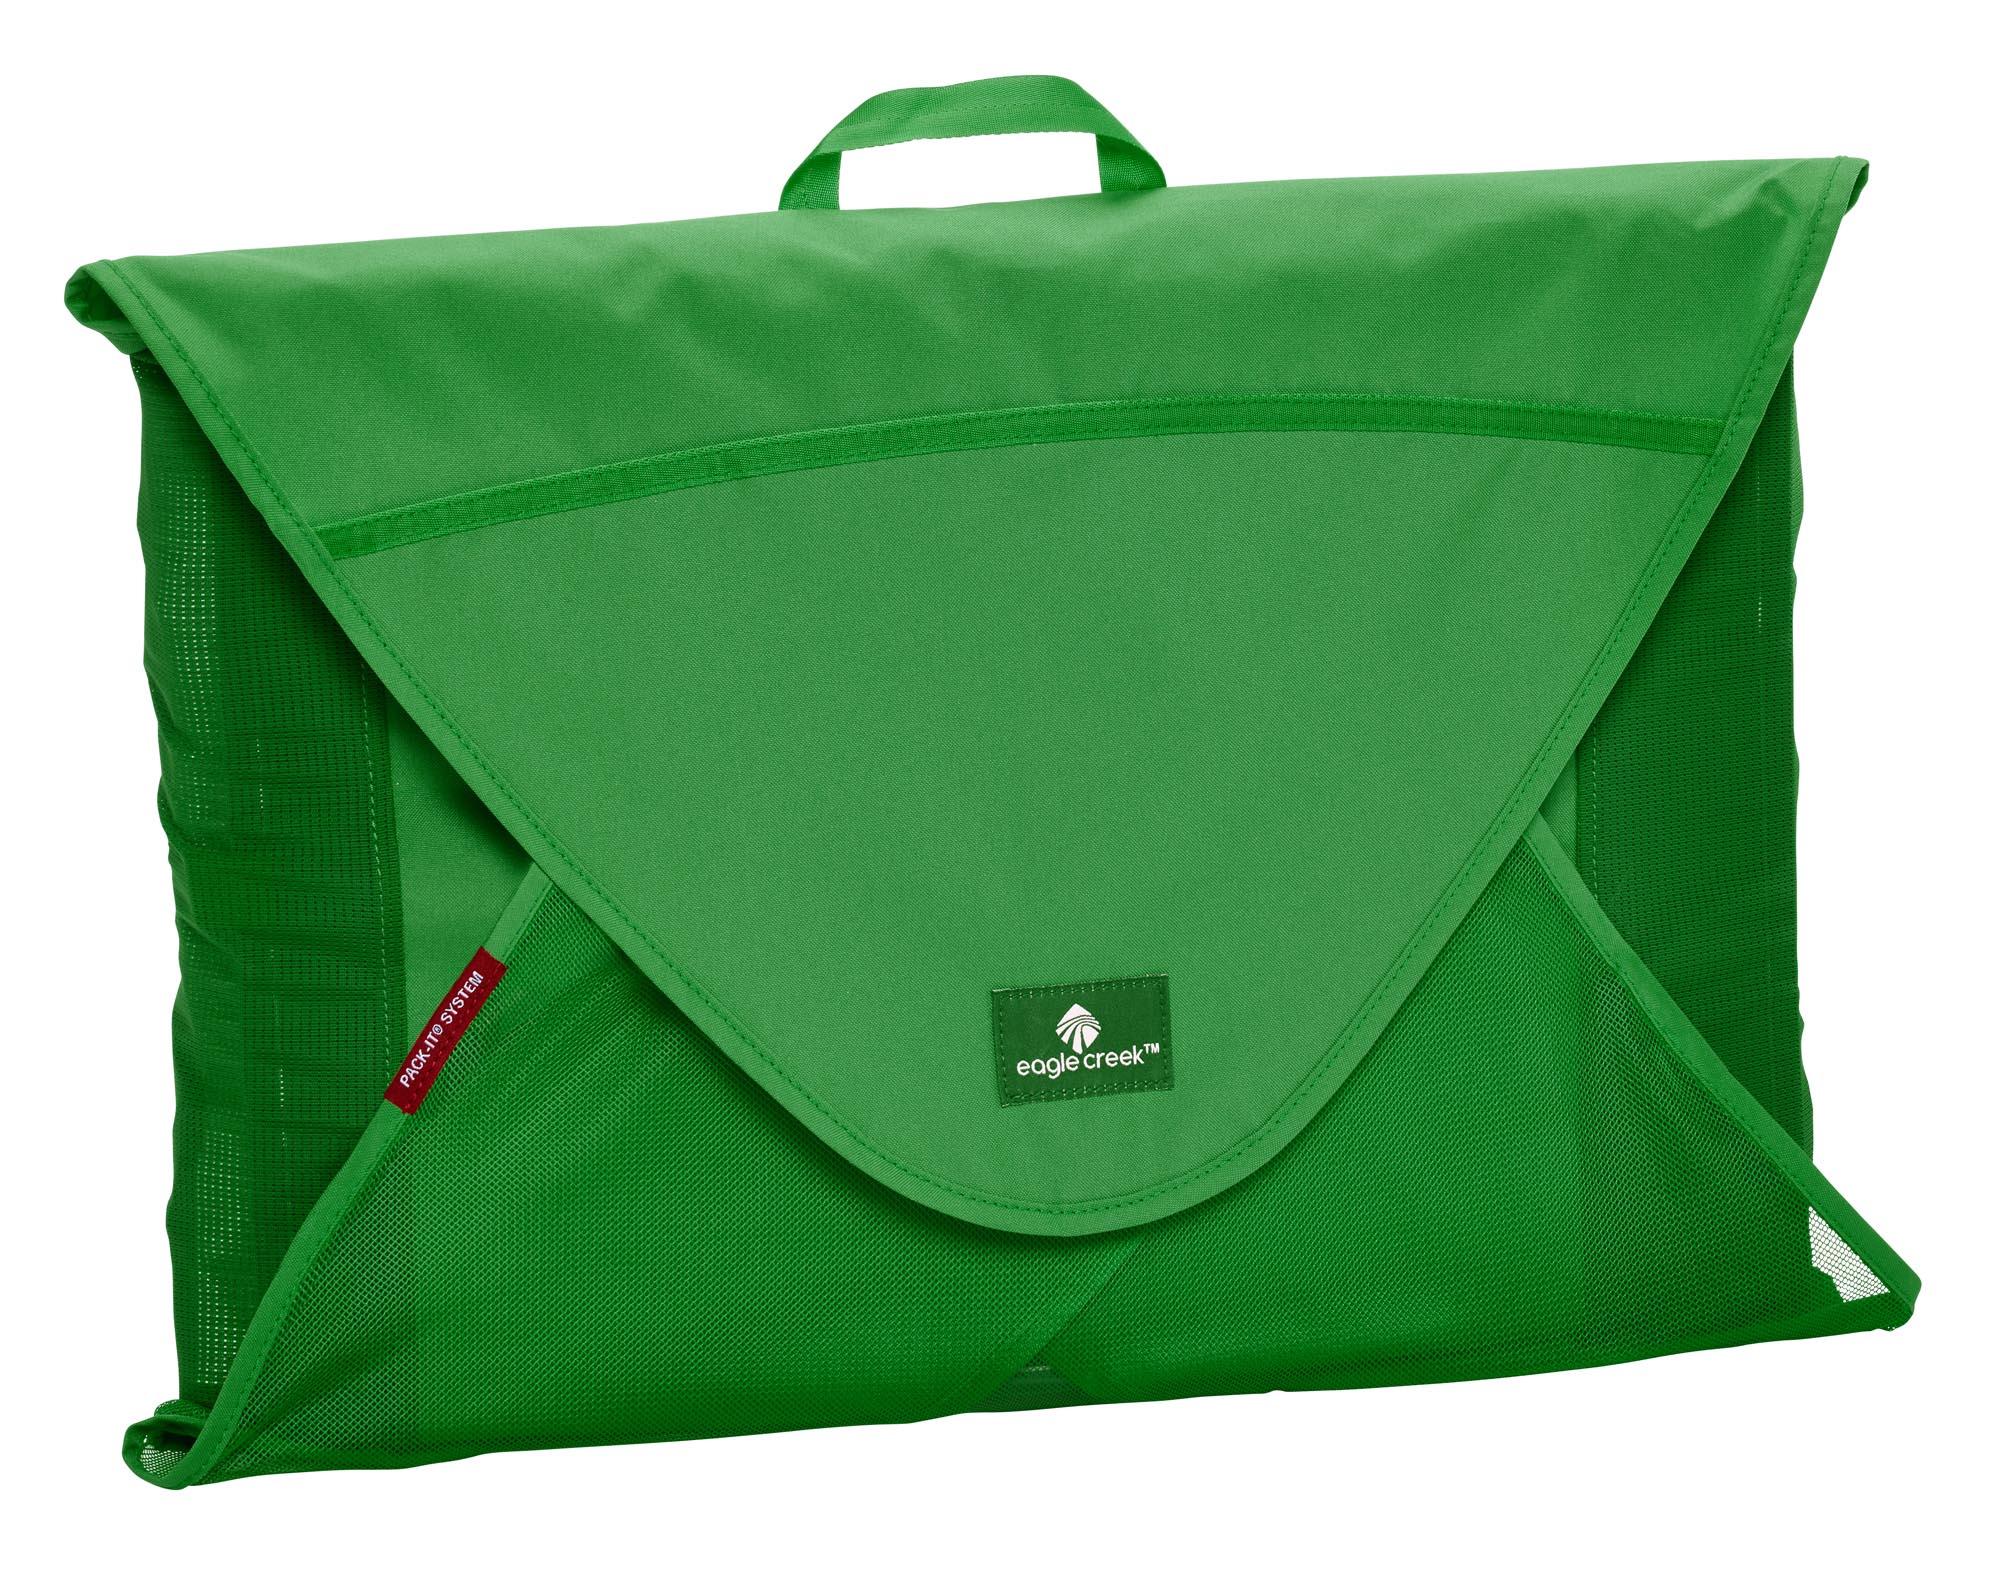 EagleCreek - Pack-It Garment Folder Large Earth Green - Packing Bags -